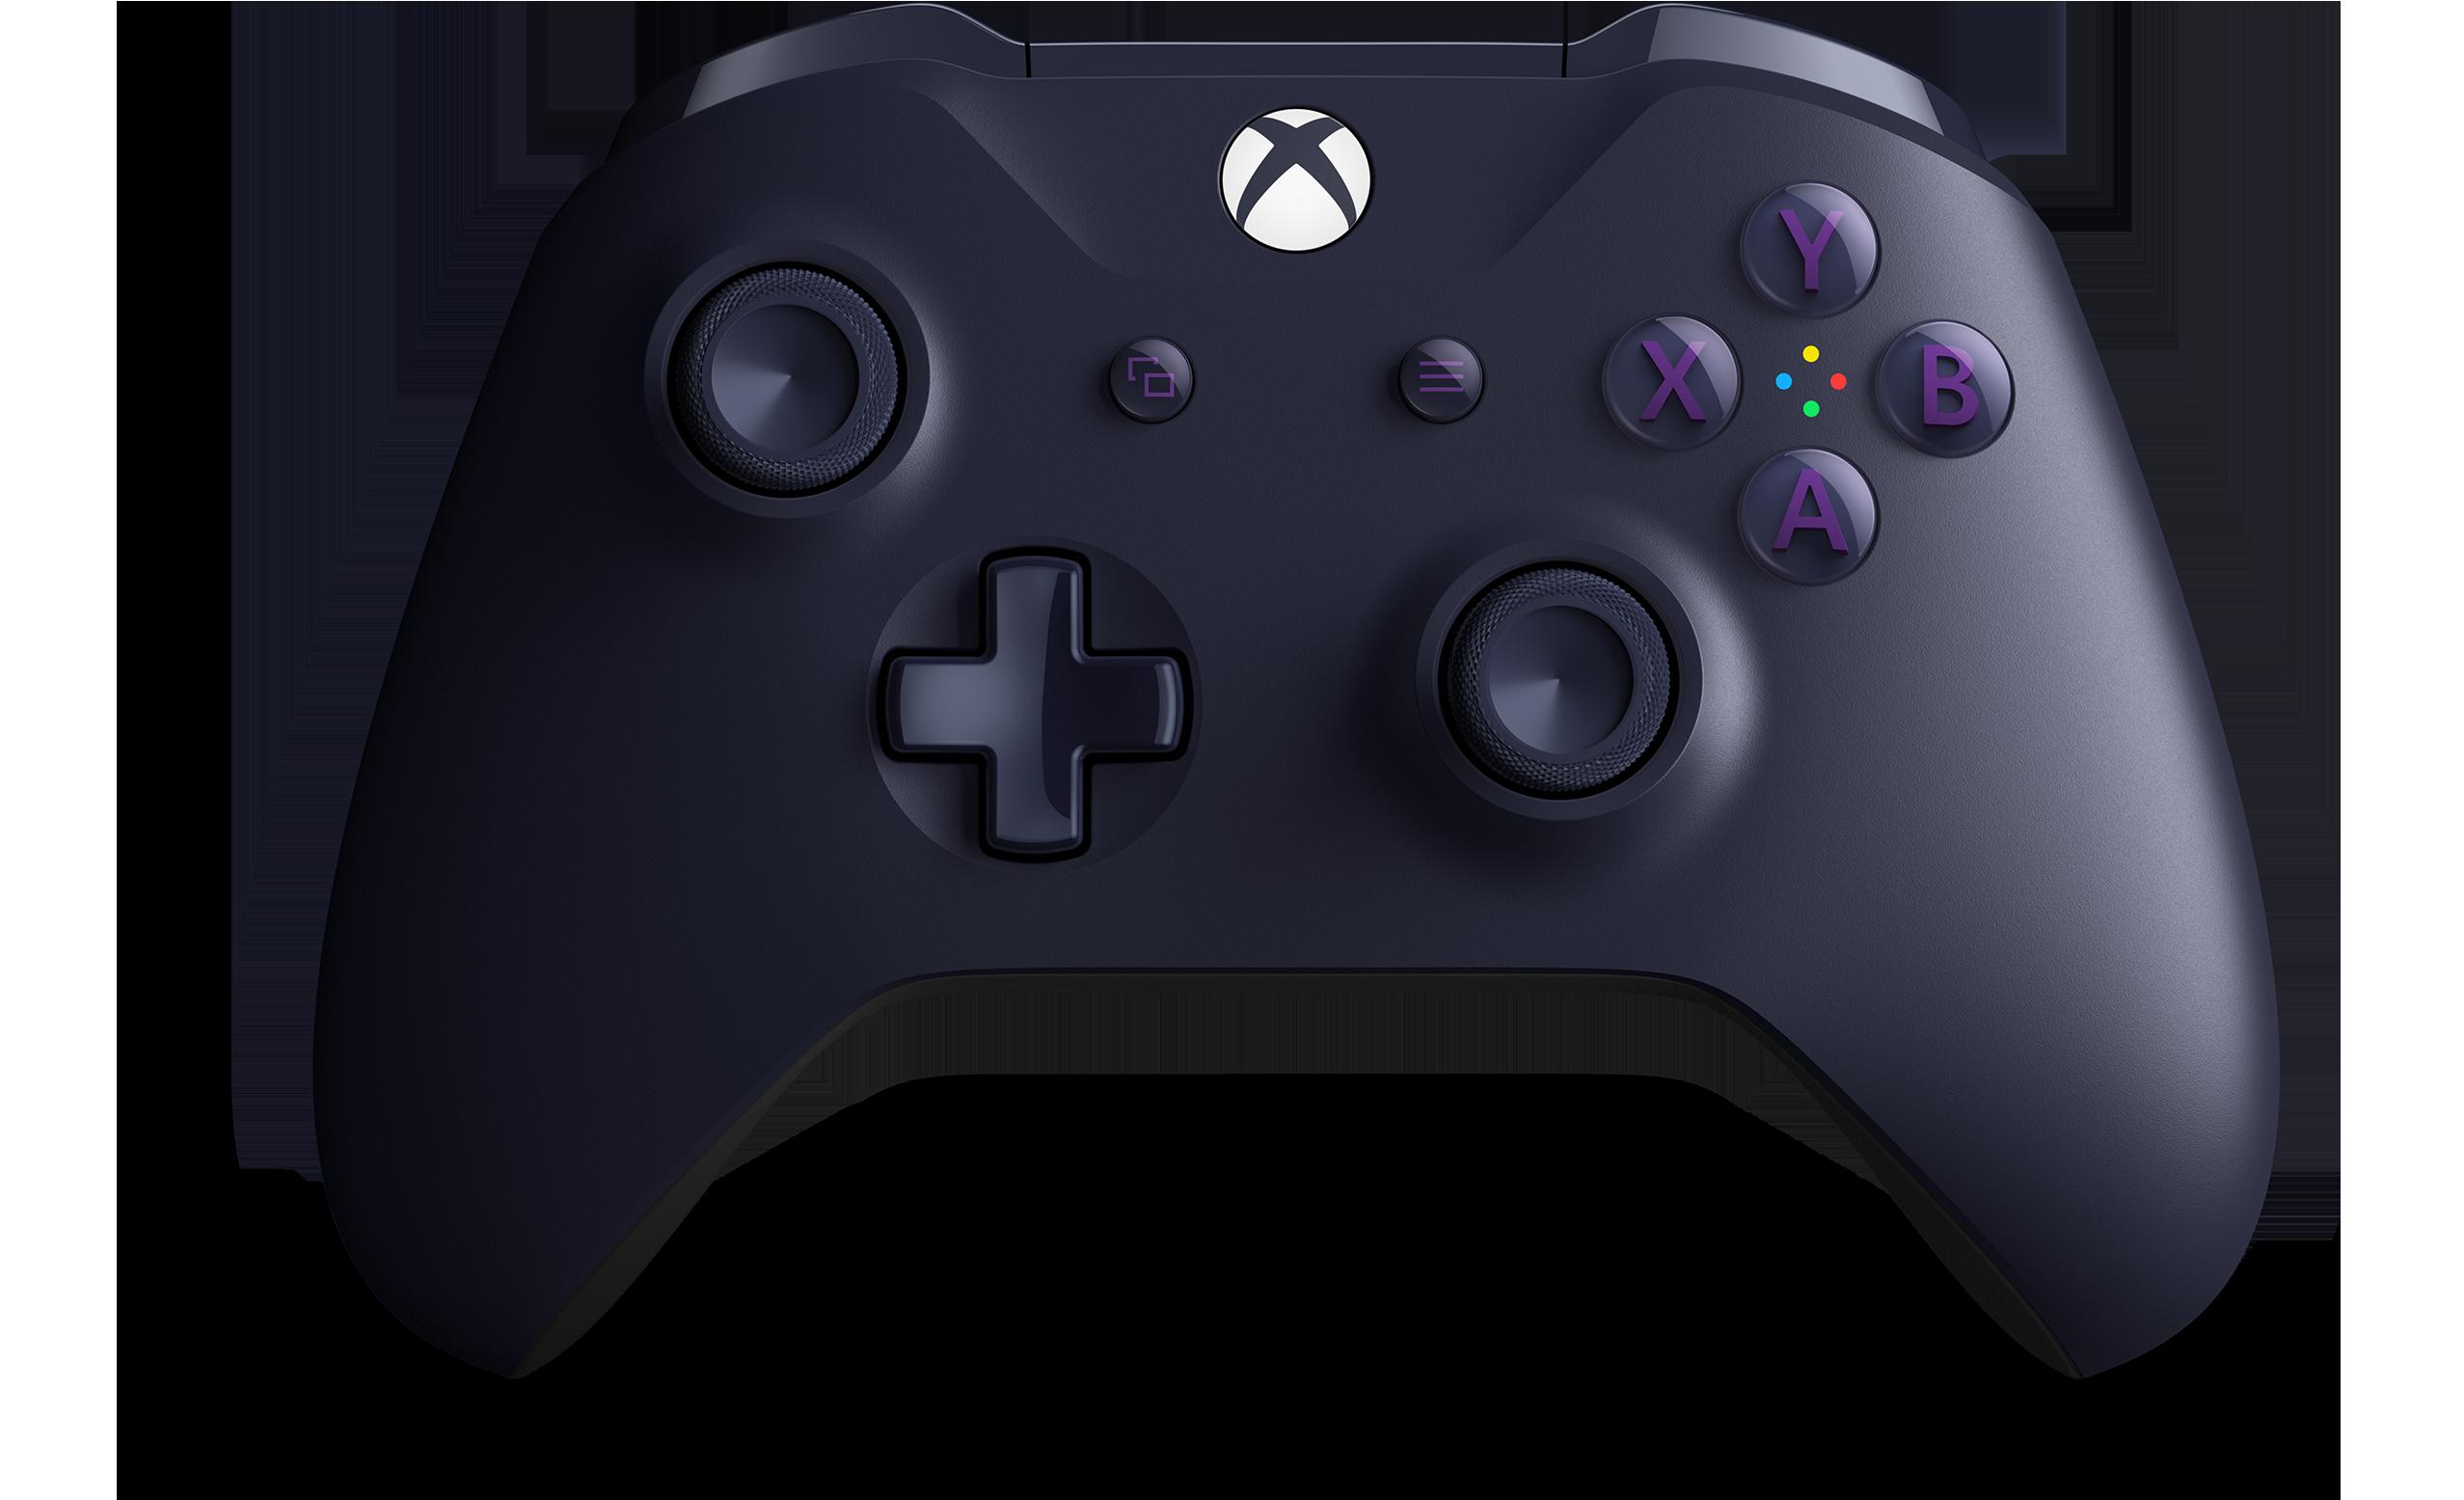 Mando inalámbrico Xbox – Fortnite Edición Especial